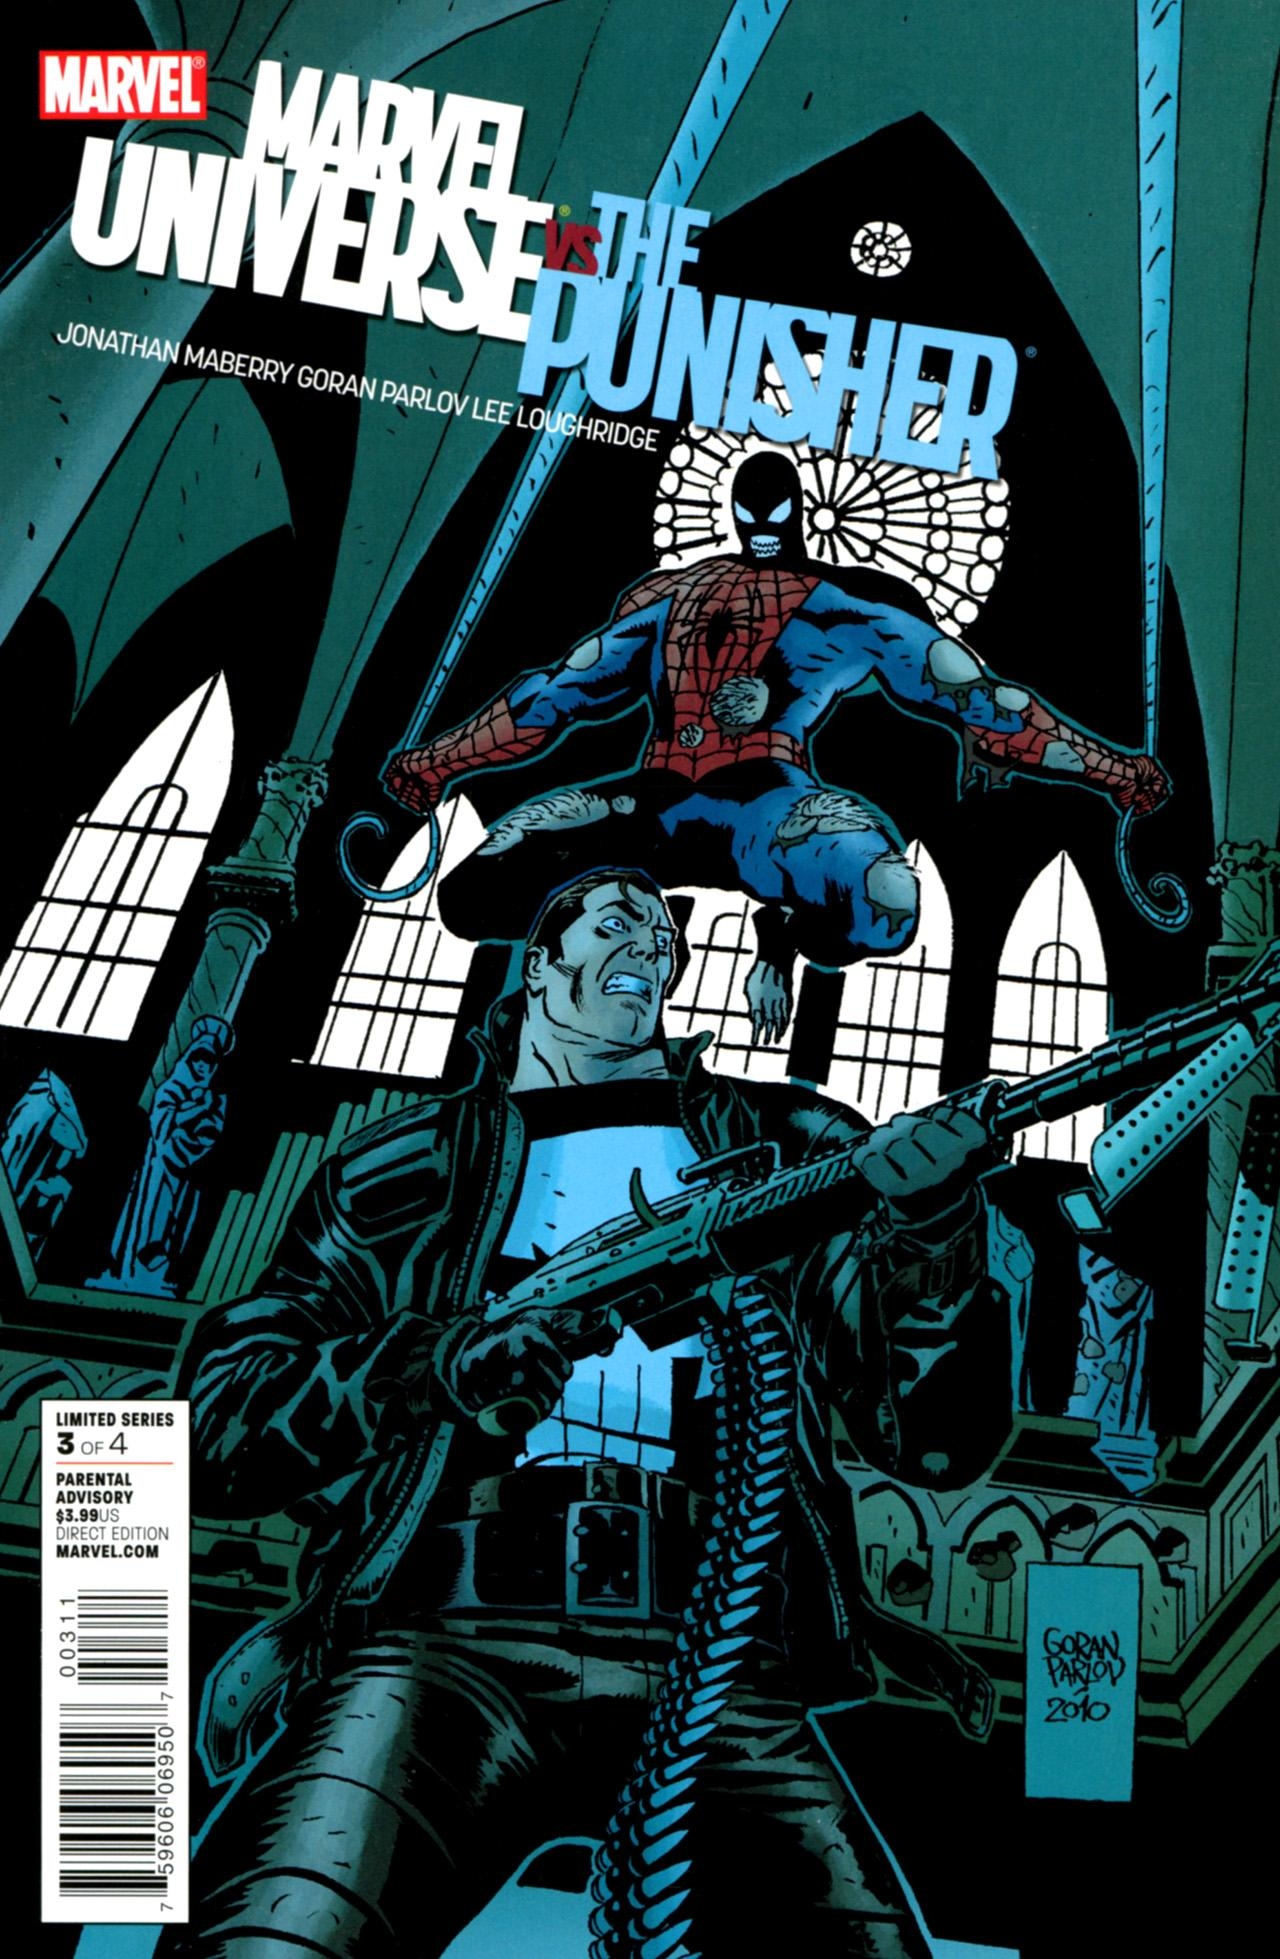 Marvel Universe Vs. The Punisher Vol 1 3